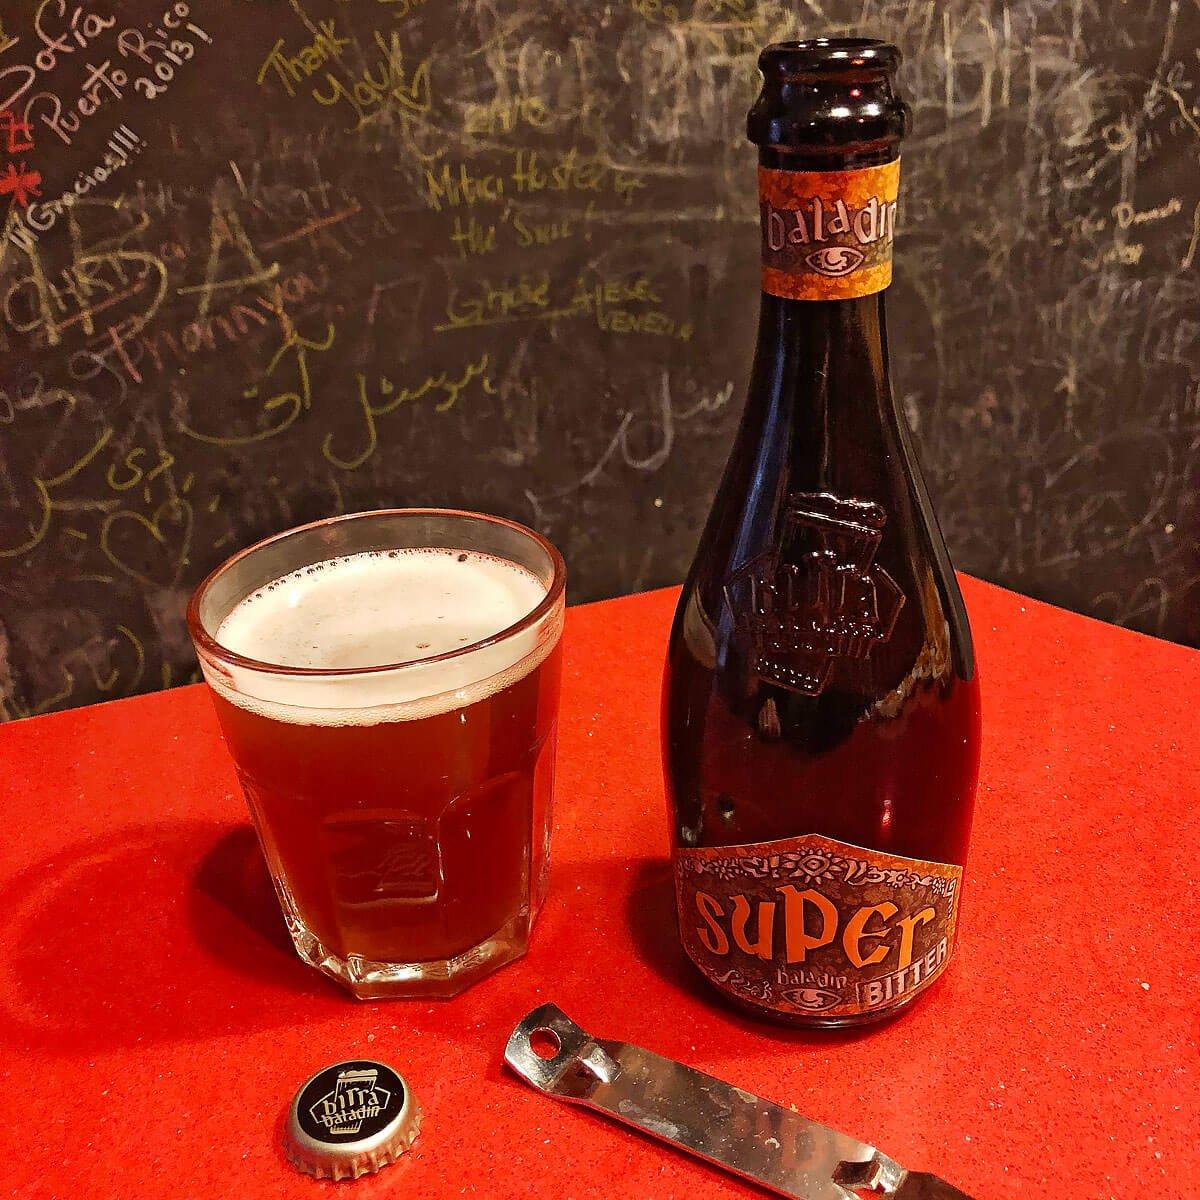 Super Bitter, a Belgian-style Strong Pale Ale by Birrificio Le Baladin